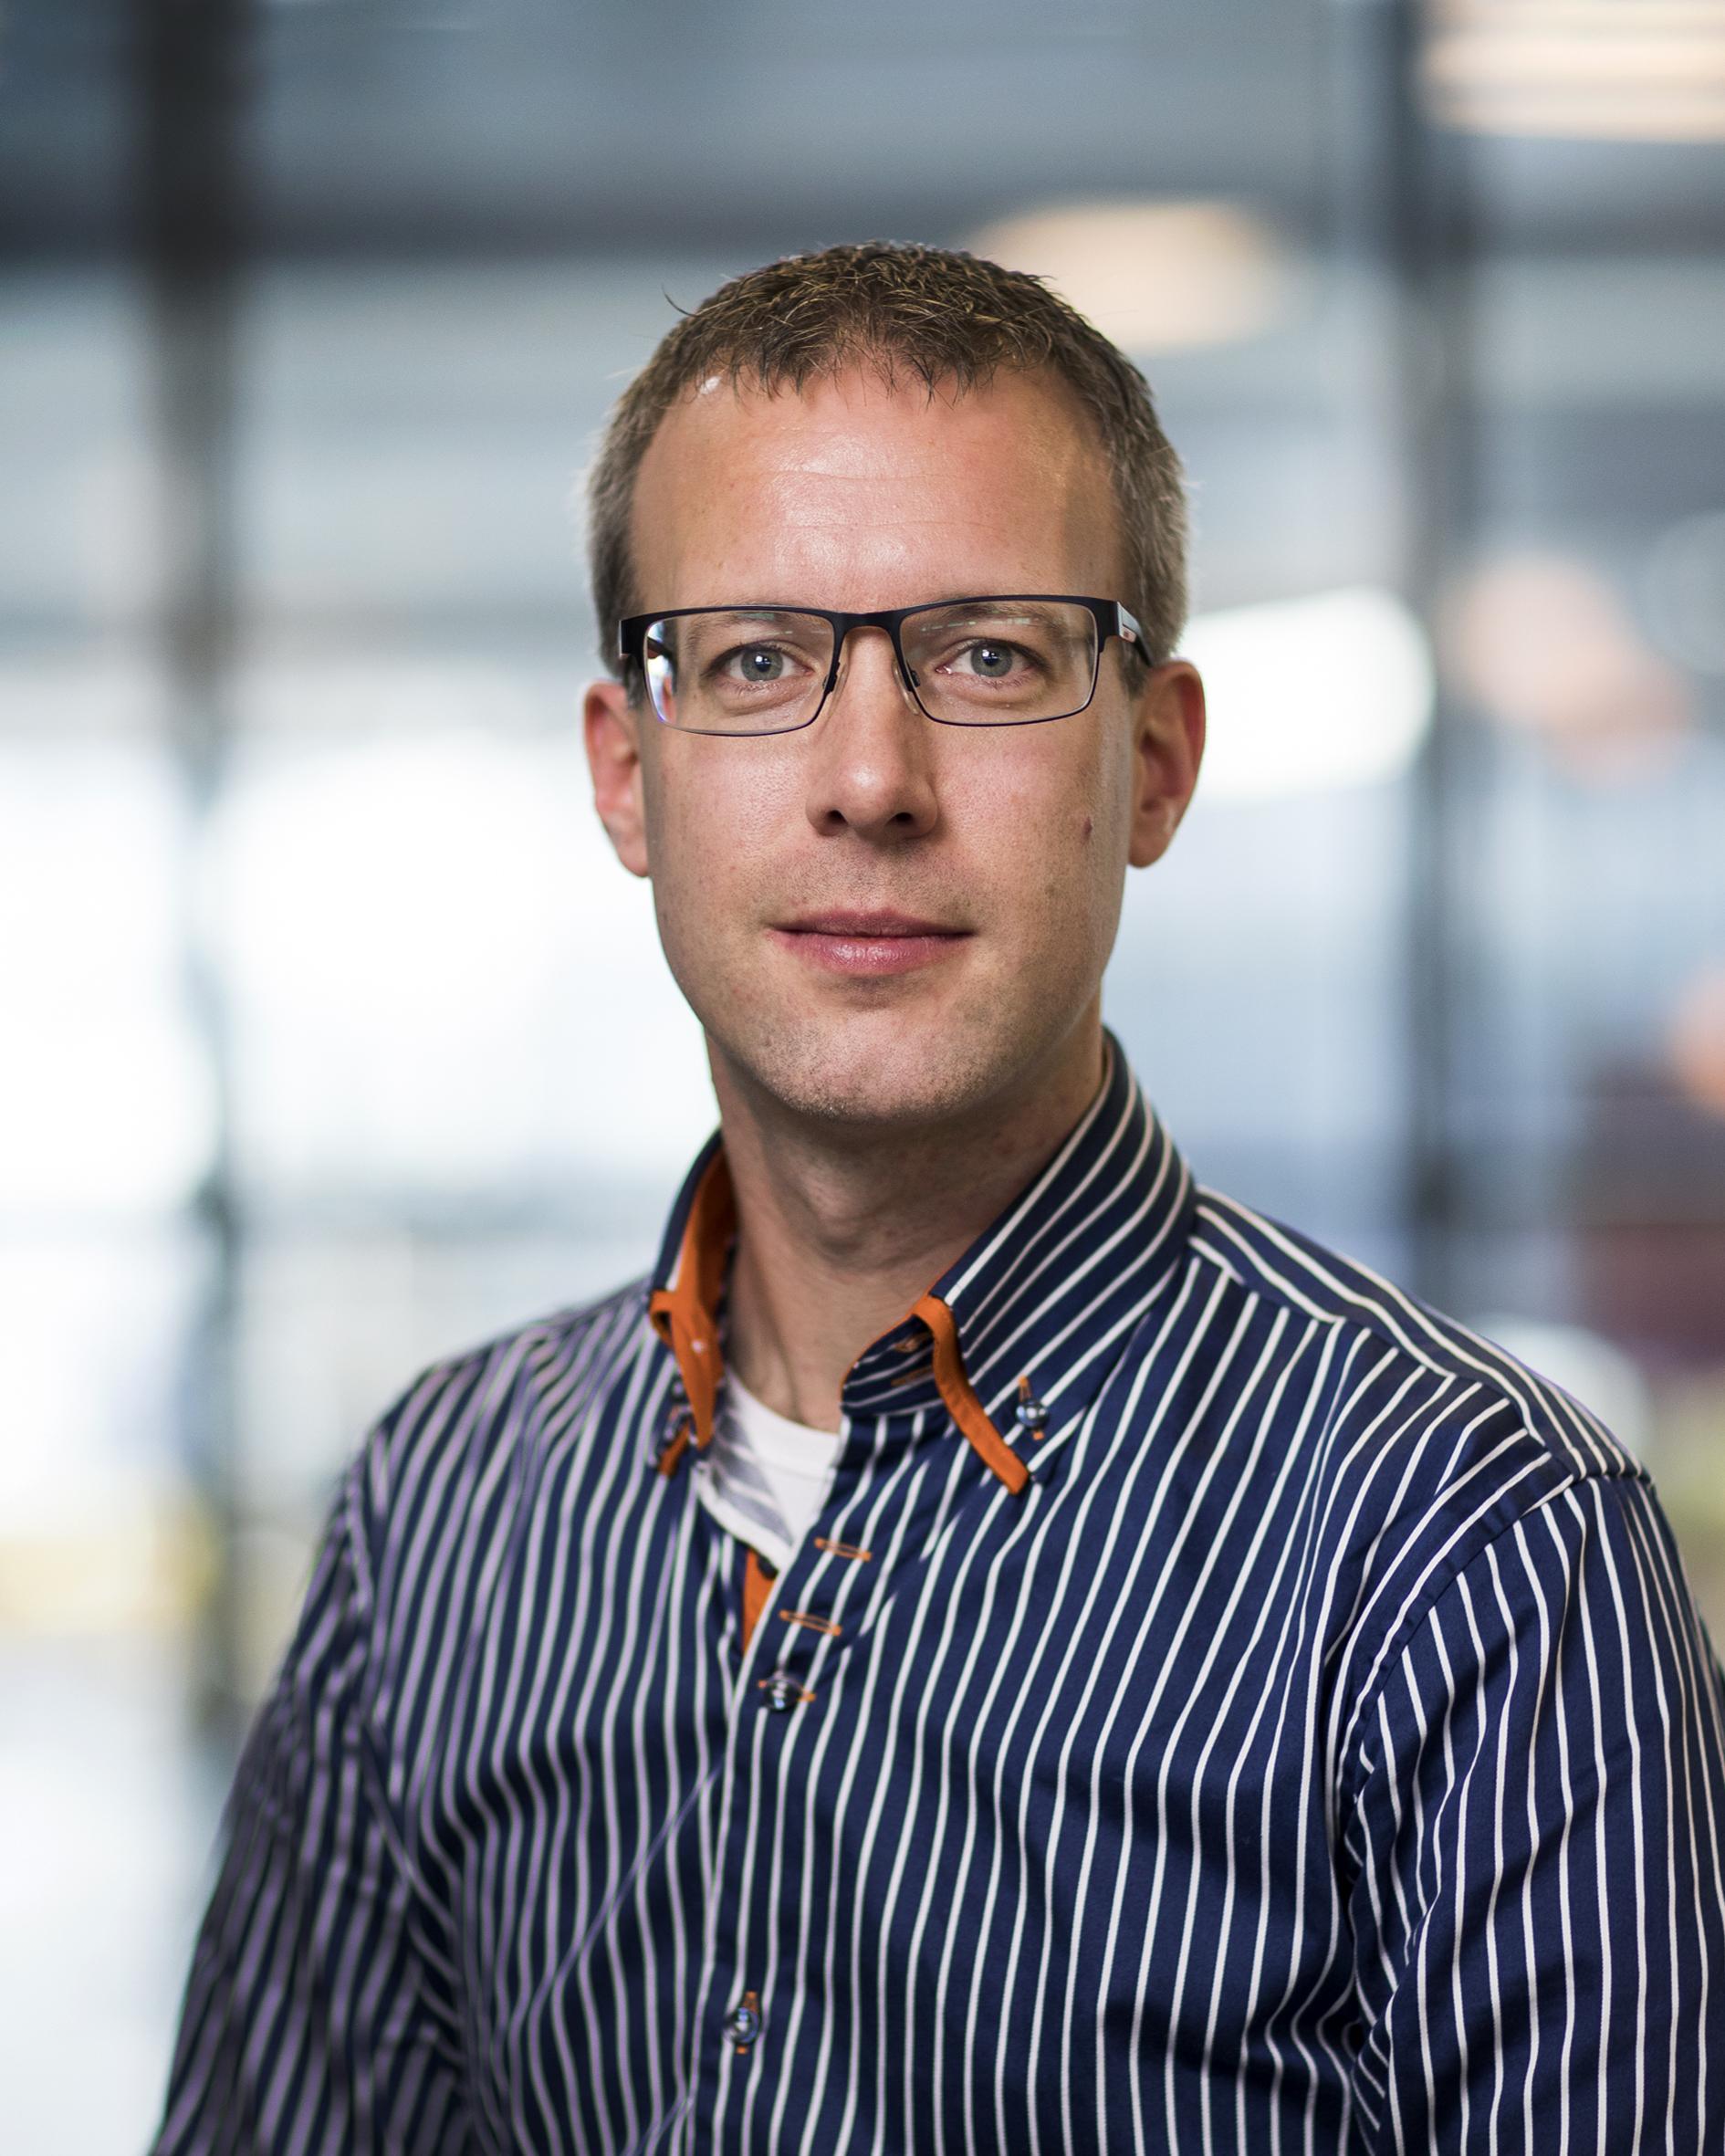 Prof. Peter Zijlstra